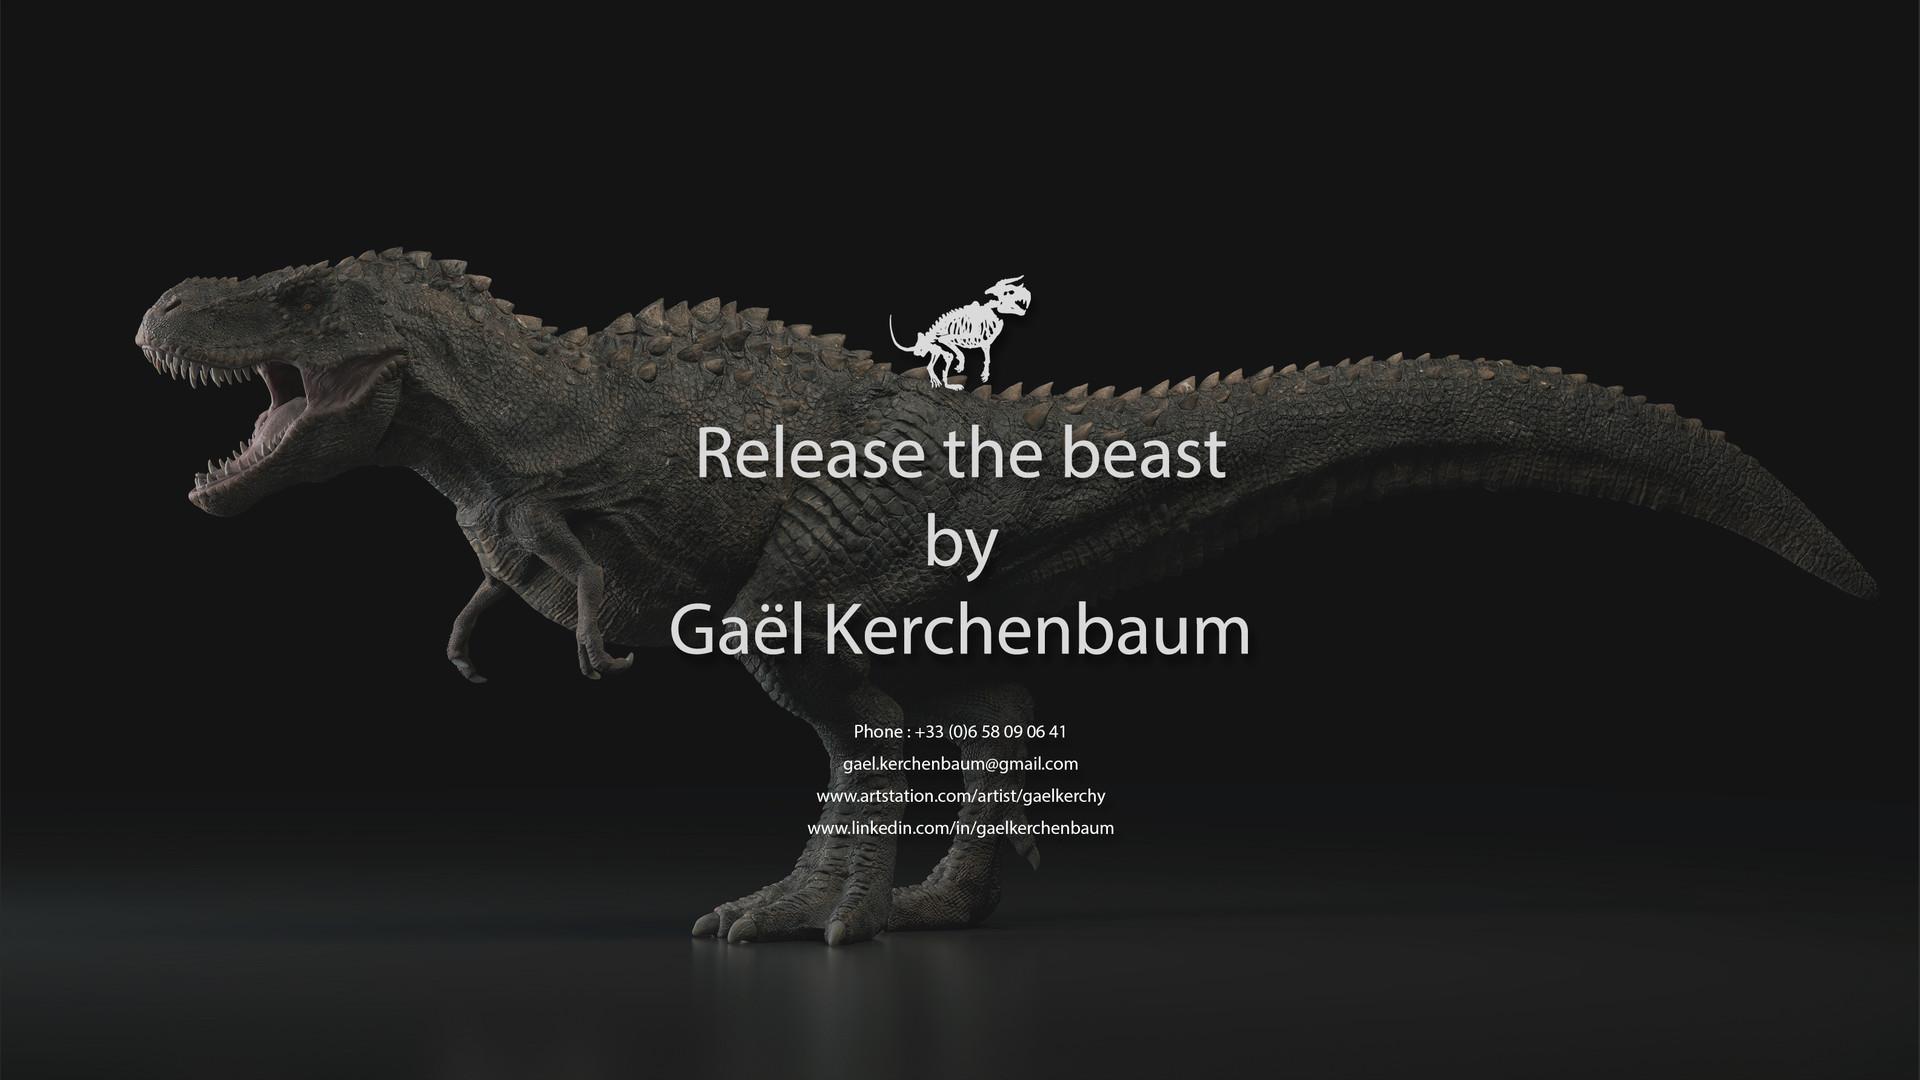 Gael kerchenbaum trex2017 001